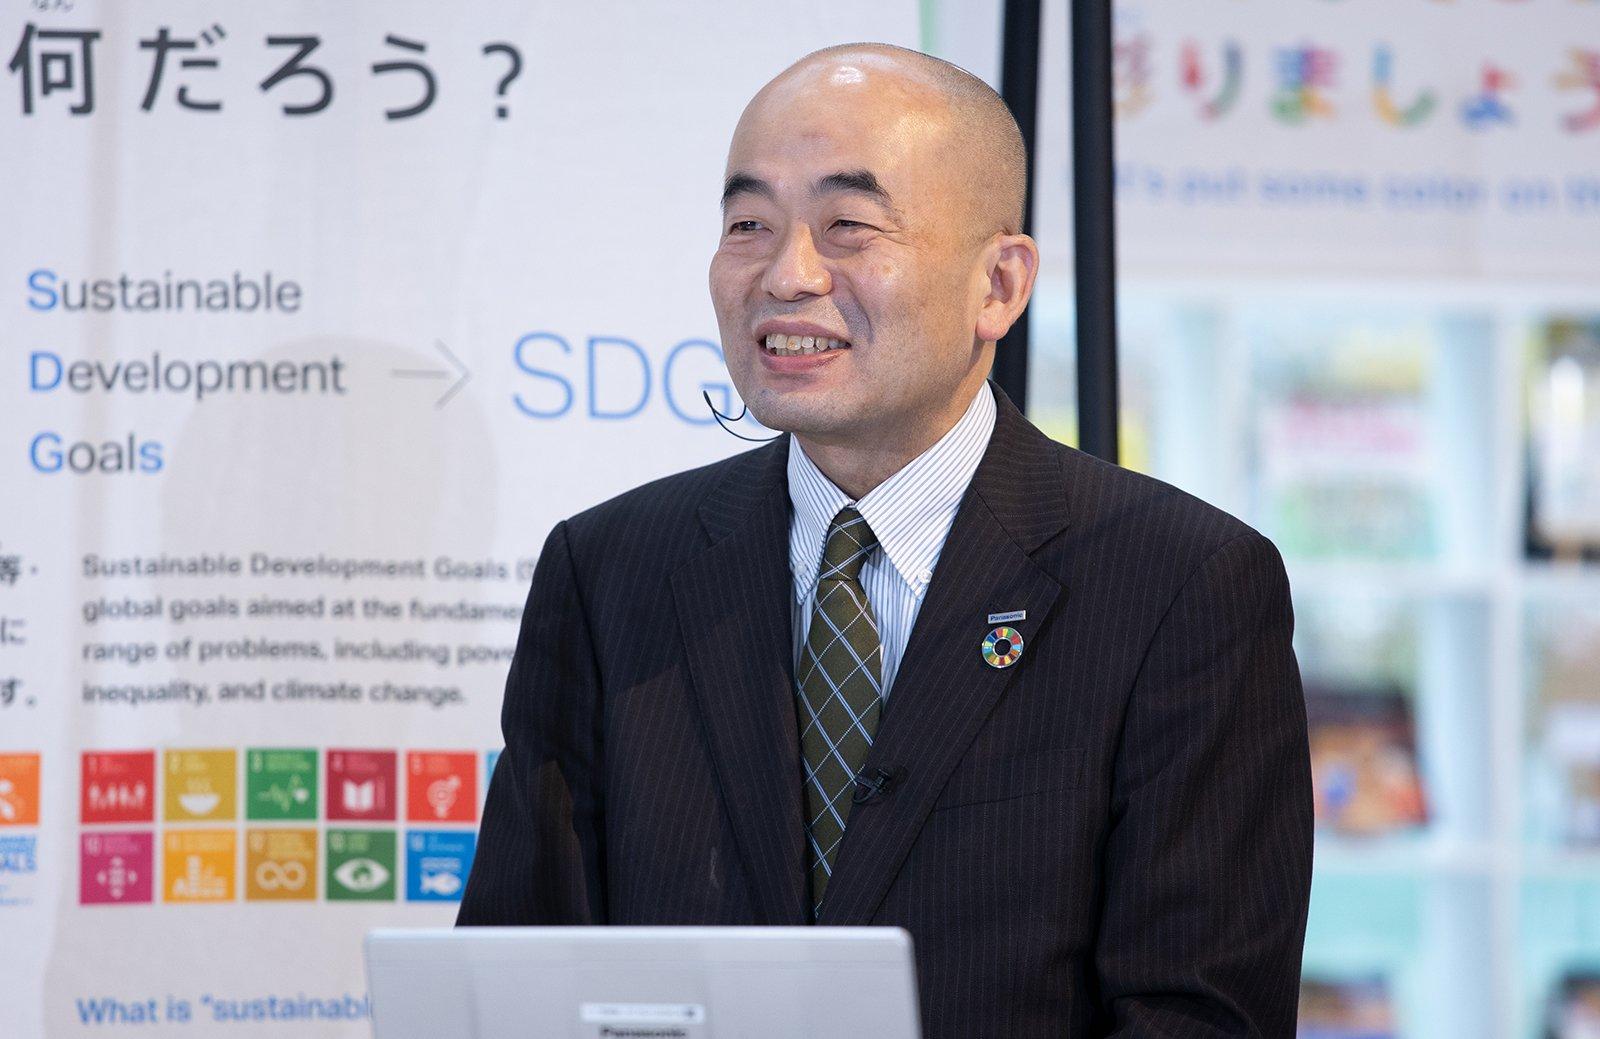 Photo: Shoji Kusumoto, Director, Environmental Management Department, Quality & Environment Division, Panasonic Corporation